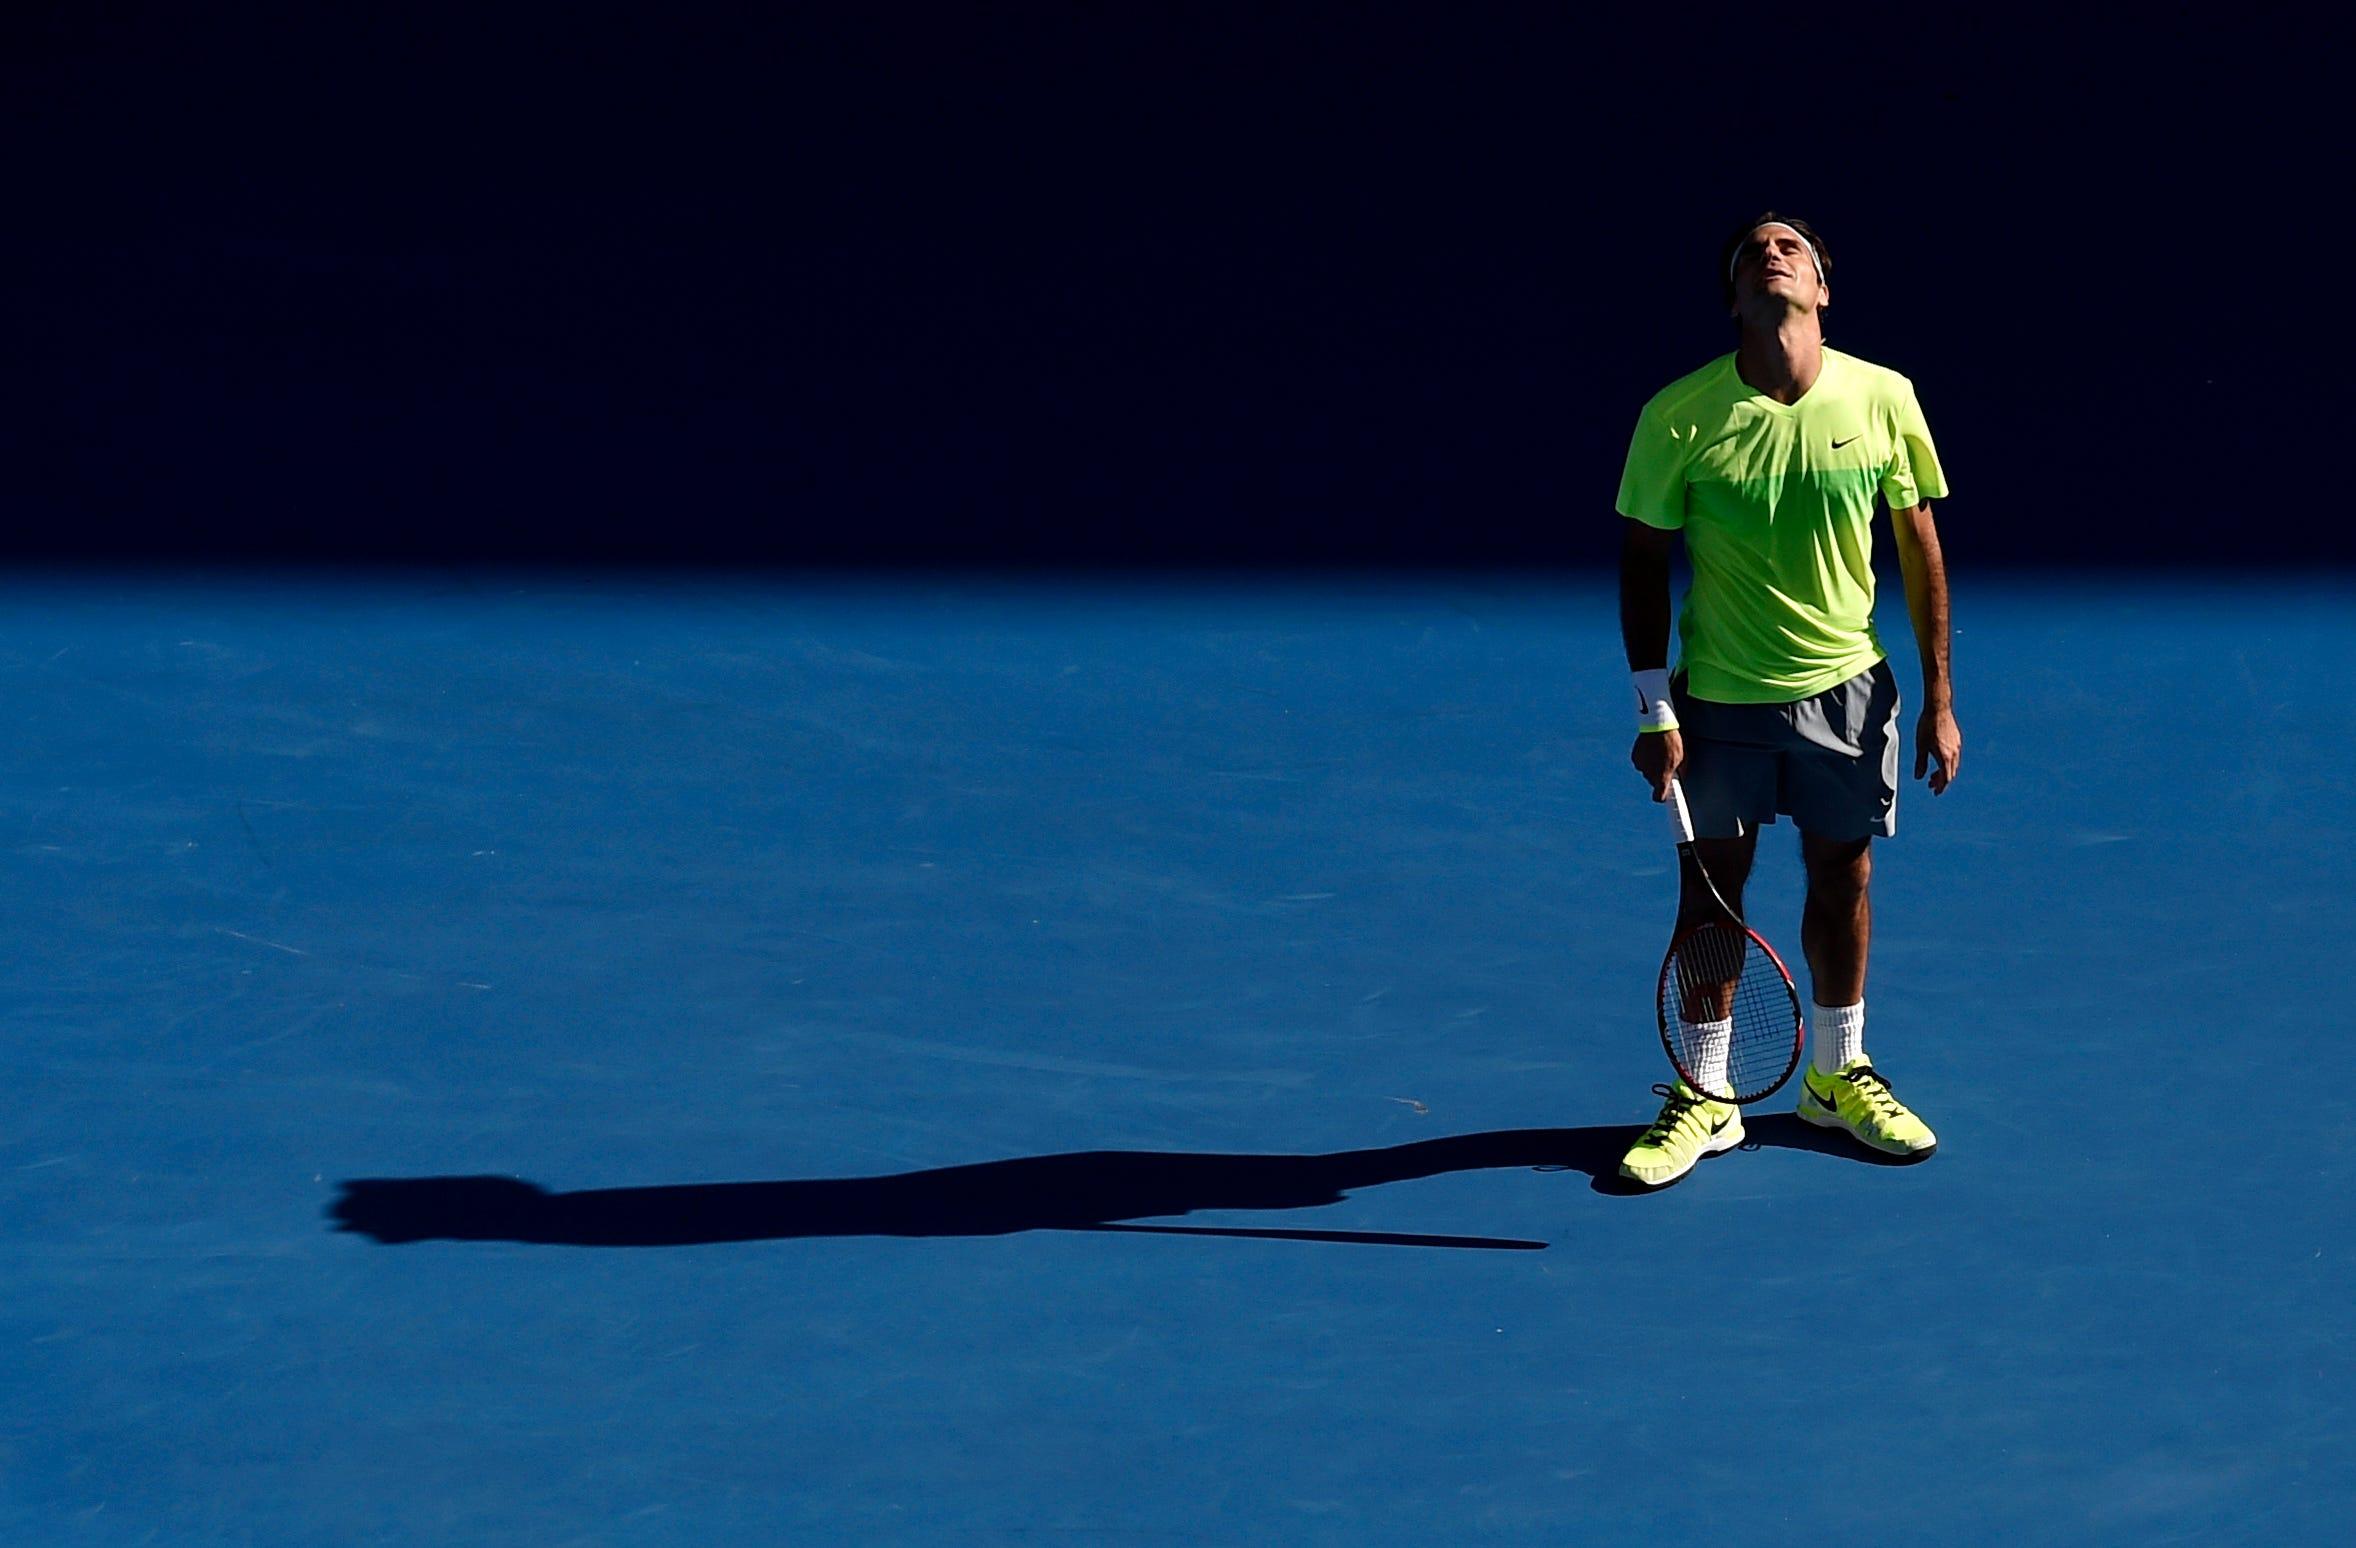 268809f09e8d 635576858554136495-APTOPIX-Australian-Open-Tennis-nyang-sheboygan-press.com-25.jpg